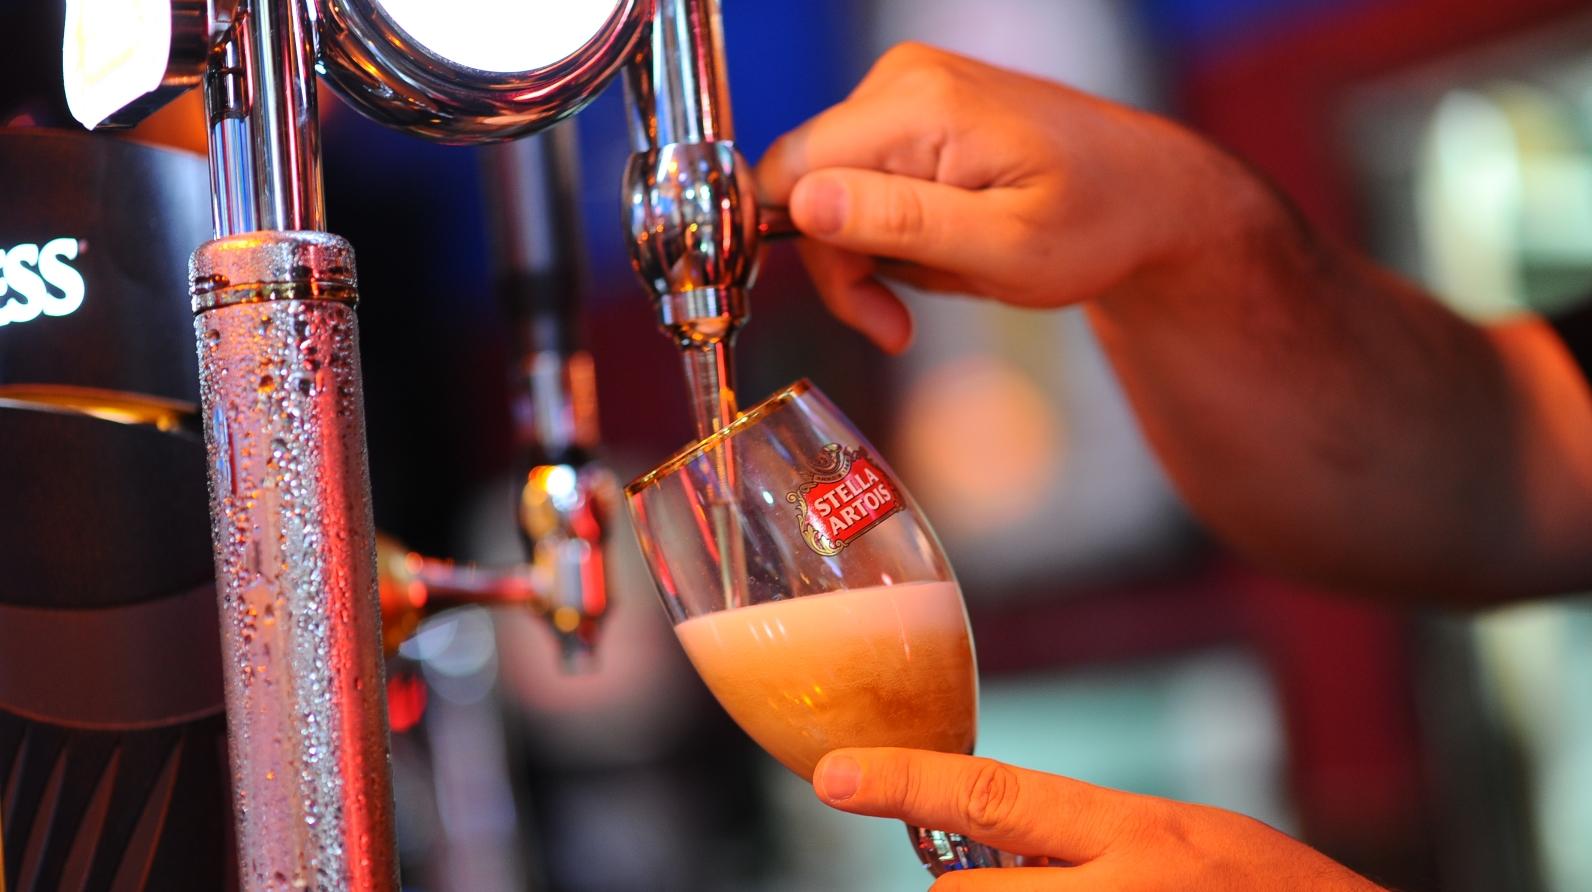 Budweiser Owner Buys Israeli Beer-tech Startup Weissbeerger photo